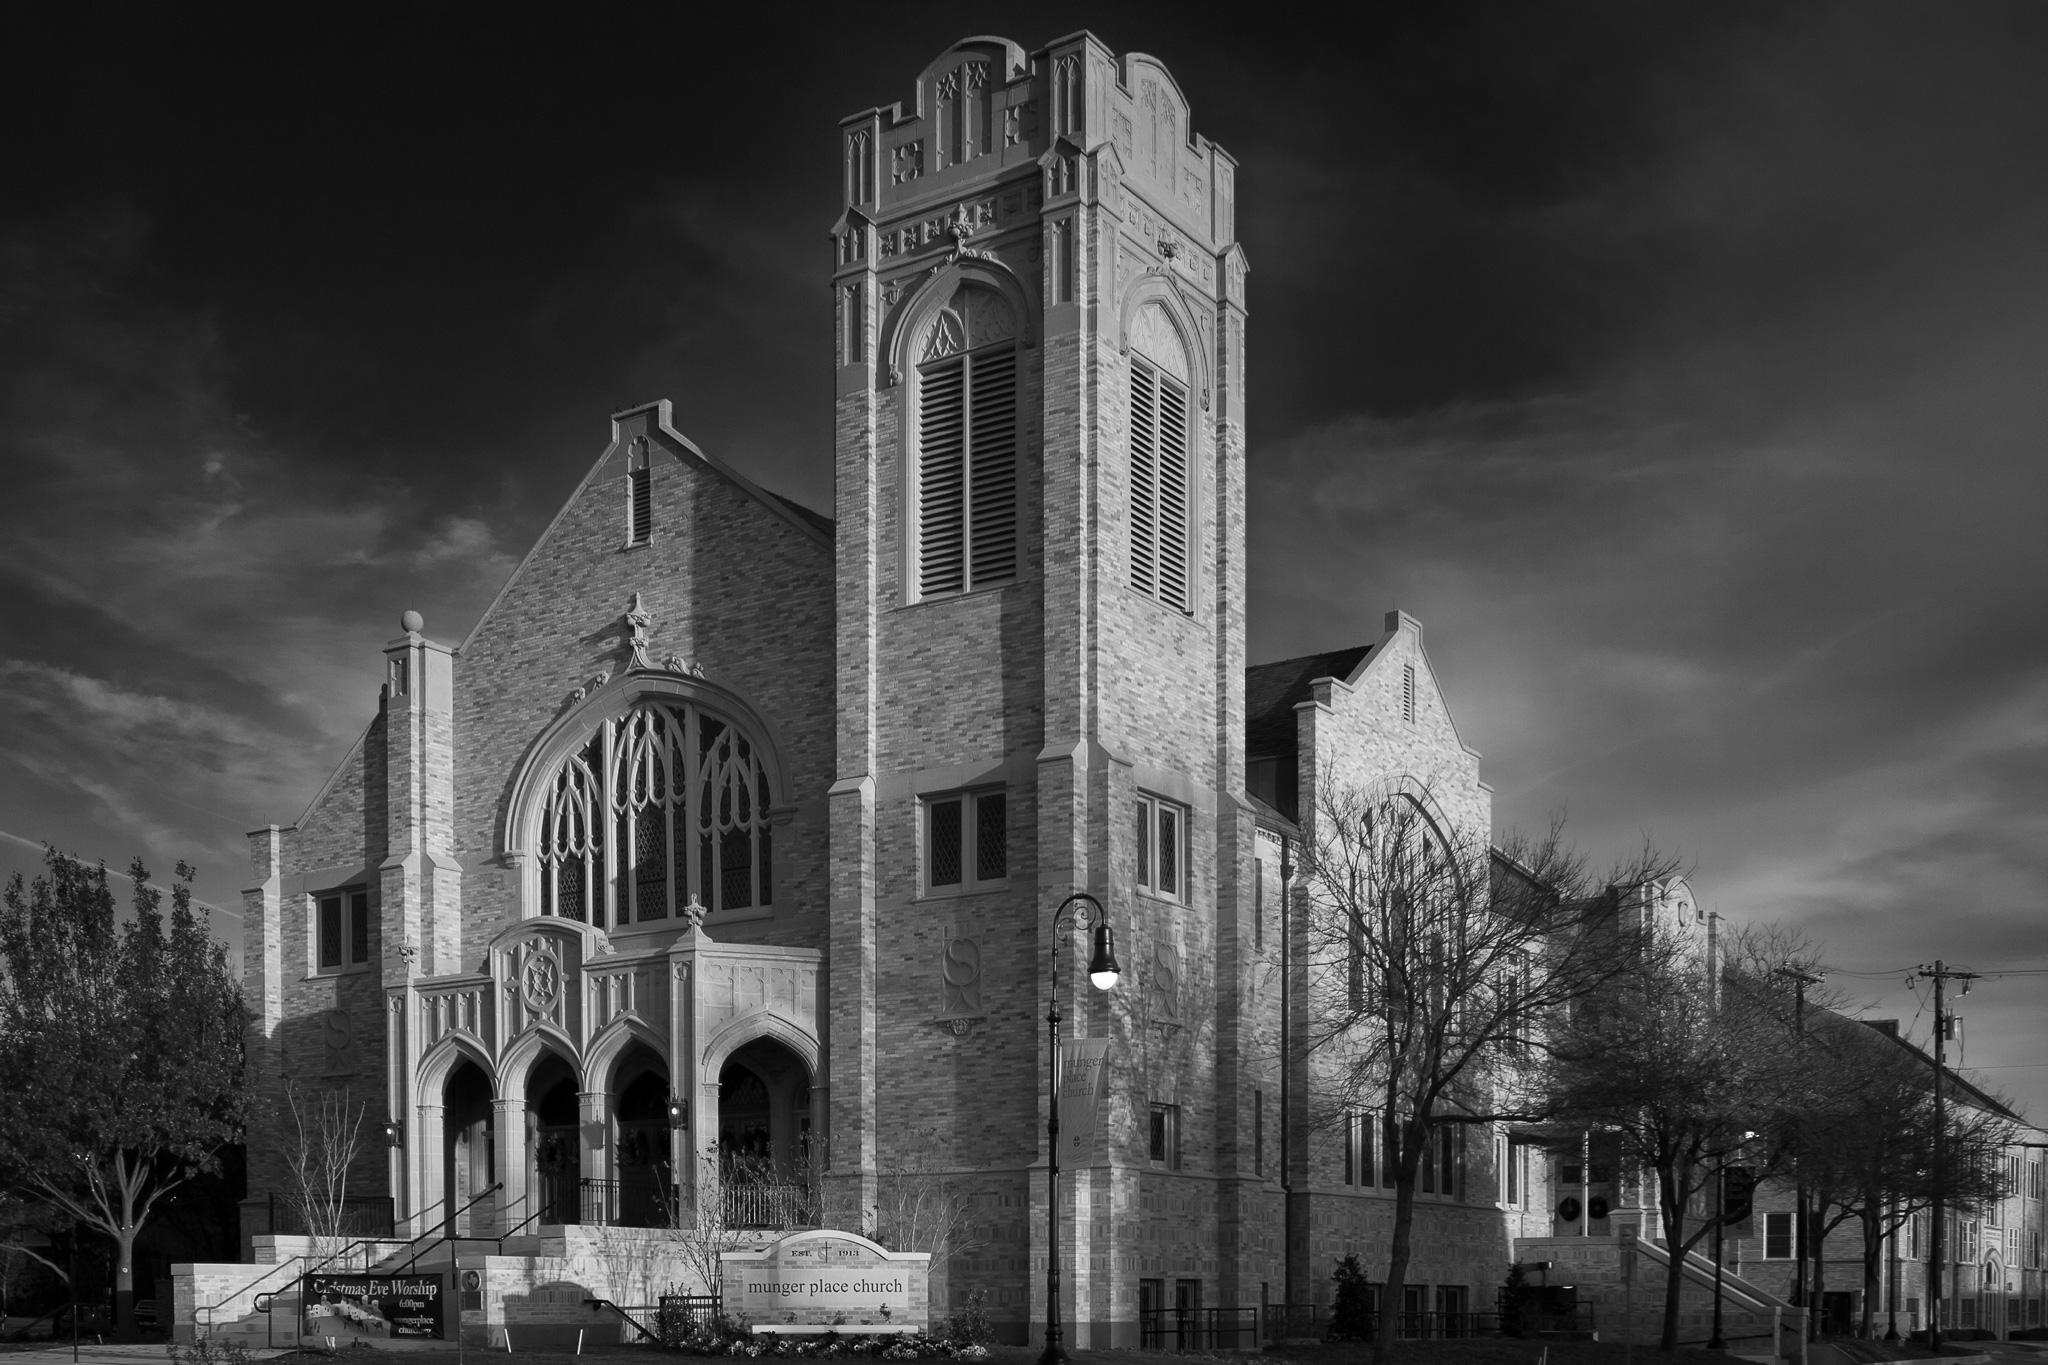 Munger-Place-Church-#1-LG.jpg